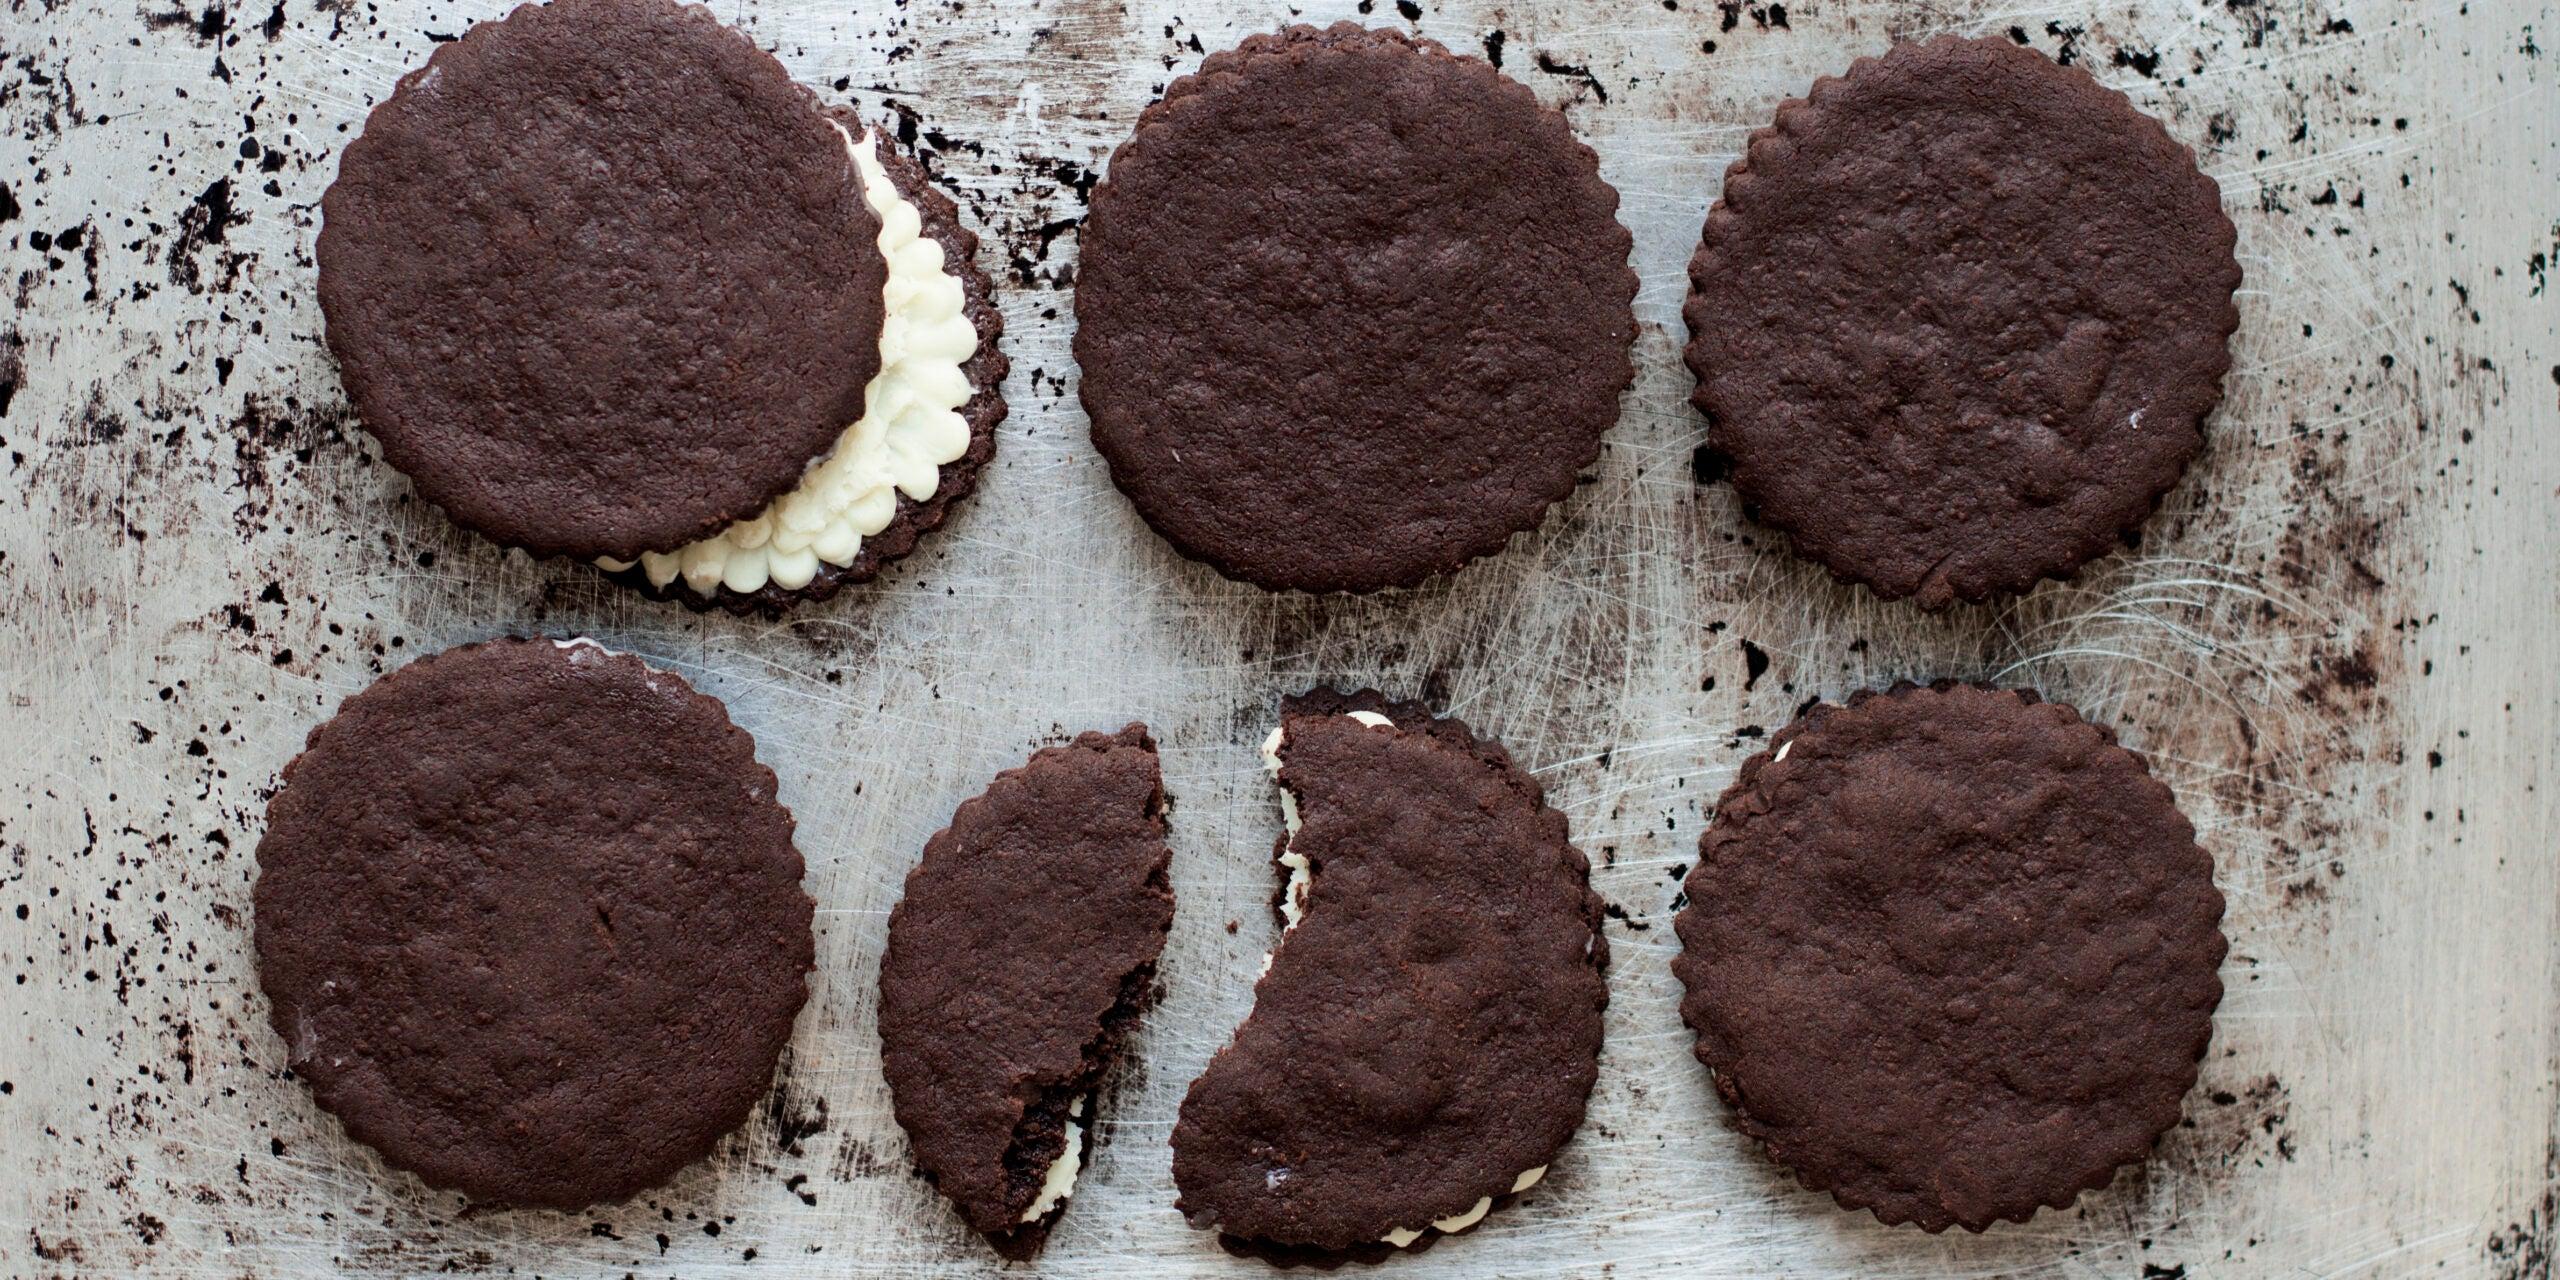 TKOs (Chocolate Sandwich Cookies)